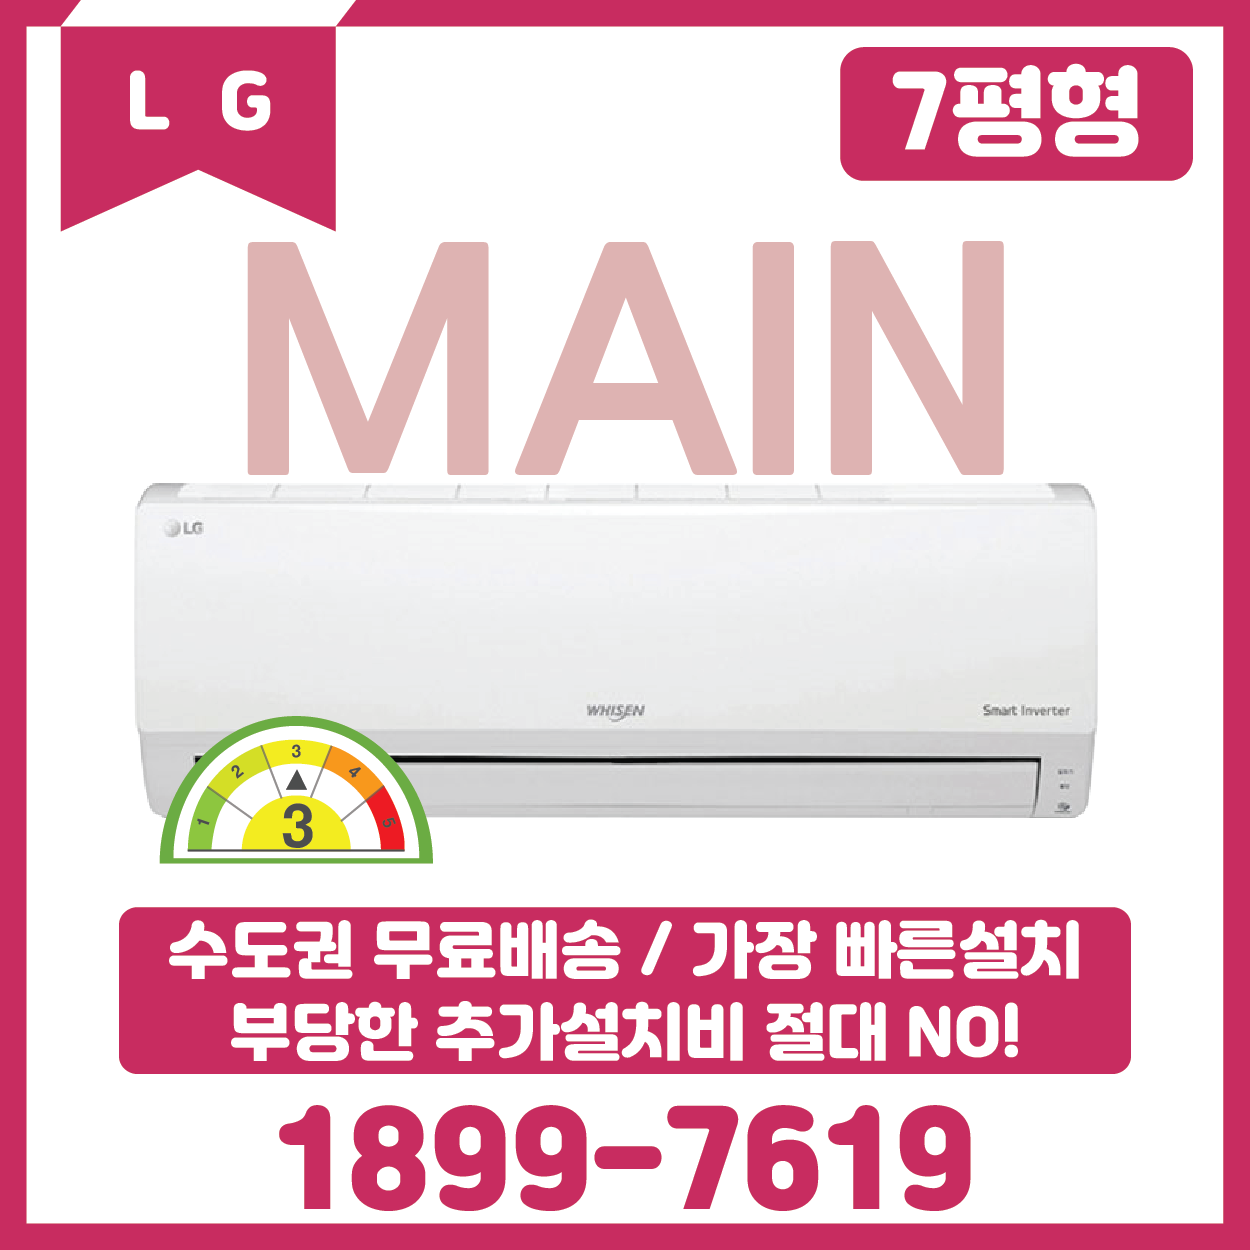 LG전자 휘센 인버터 벽걸이에어컨 7평형 SQ07BAPWBS 실외기포함 수도권 무료배송/메인